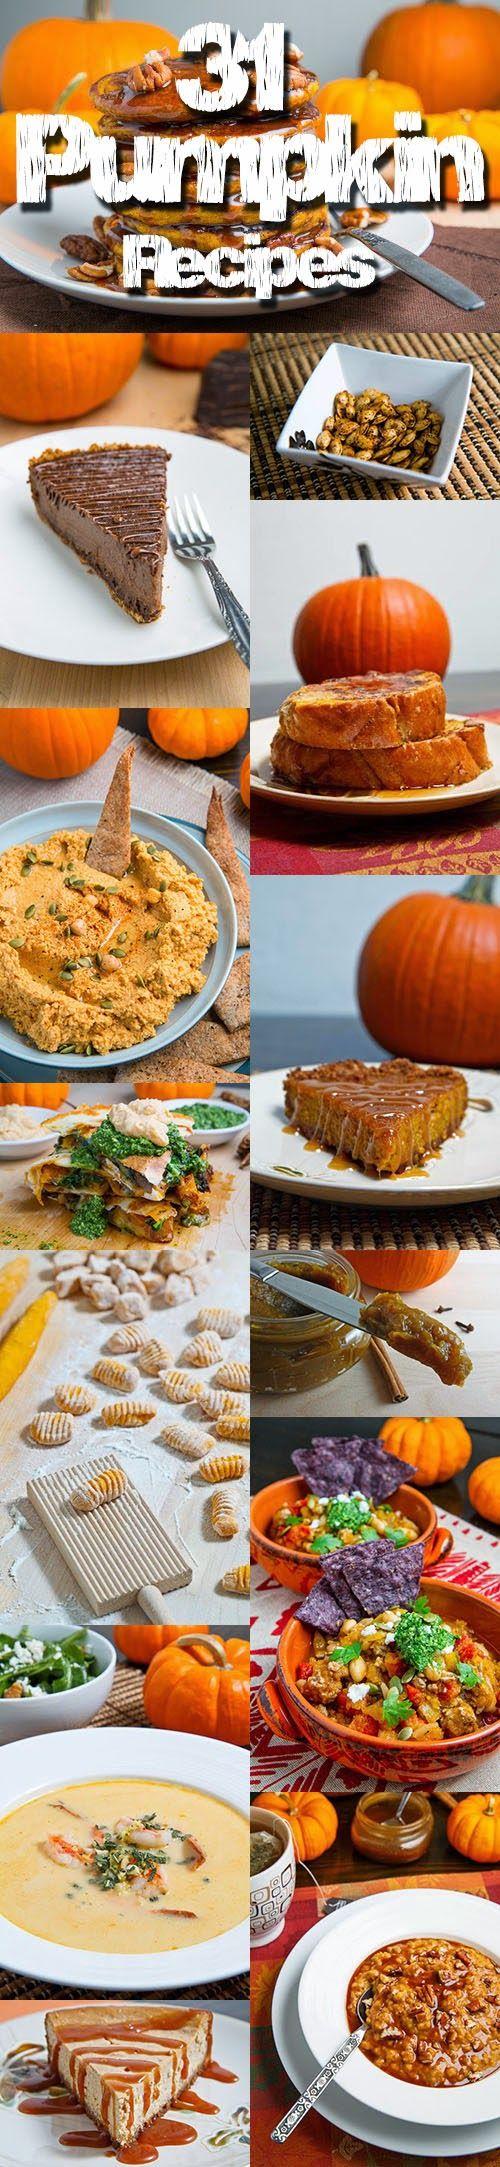 31 Pumpkin Recipes | Closet Cooking | Bloglovin'